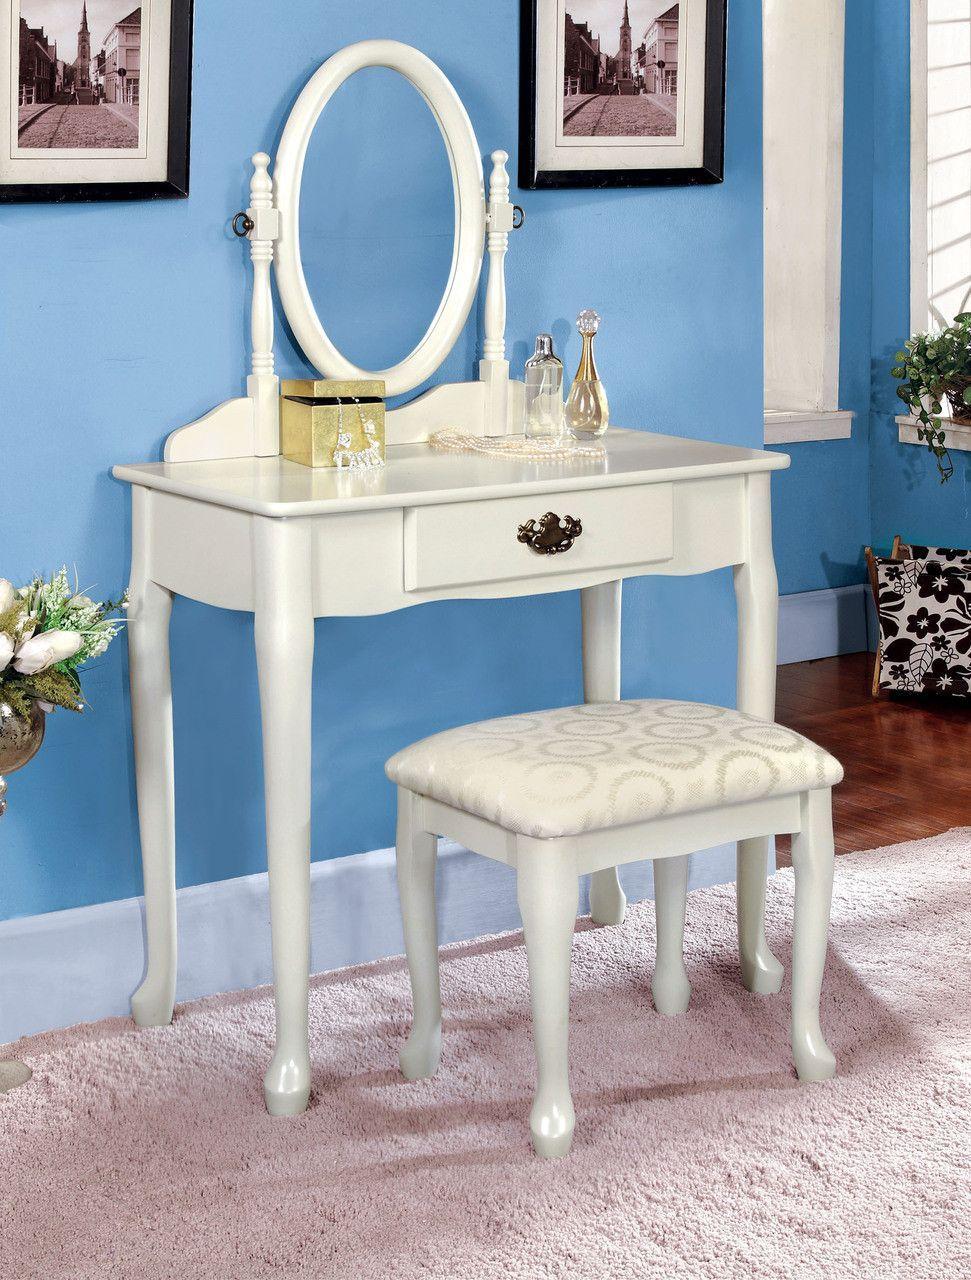 Best 25 vanity for sale ideas on pinterest bathroom vanities for sale bathroom vanity sale for Bathroom vanities for sale